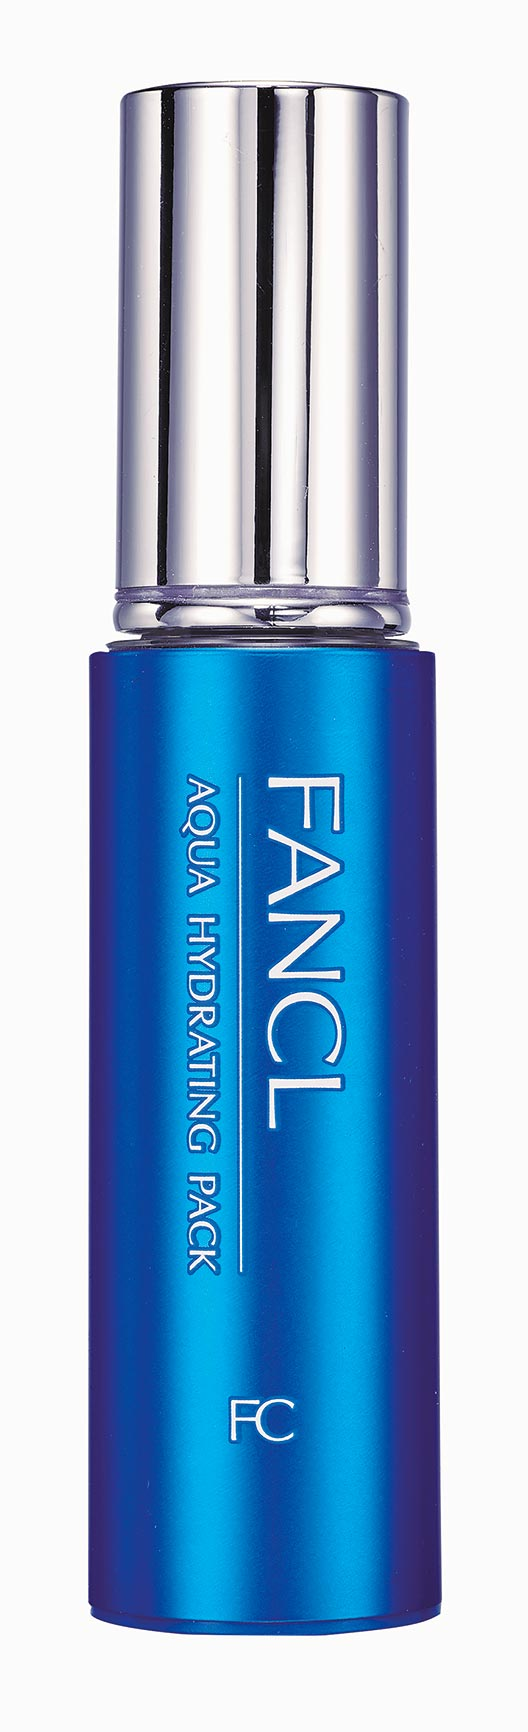 FANCL保濕修護嫩膚凝膜30g,1300元。(FANCL提供)